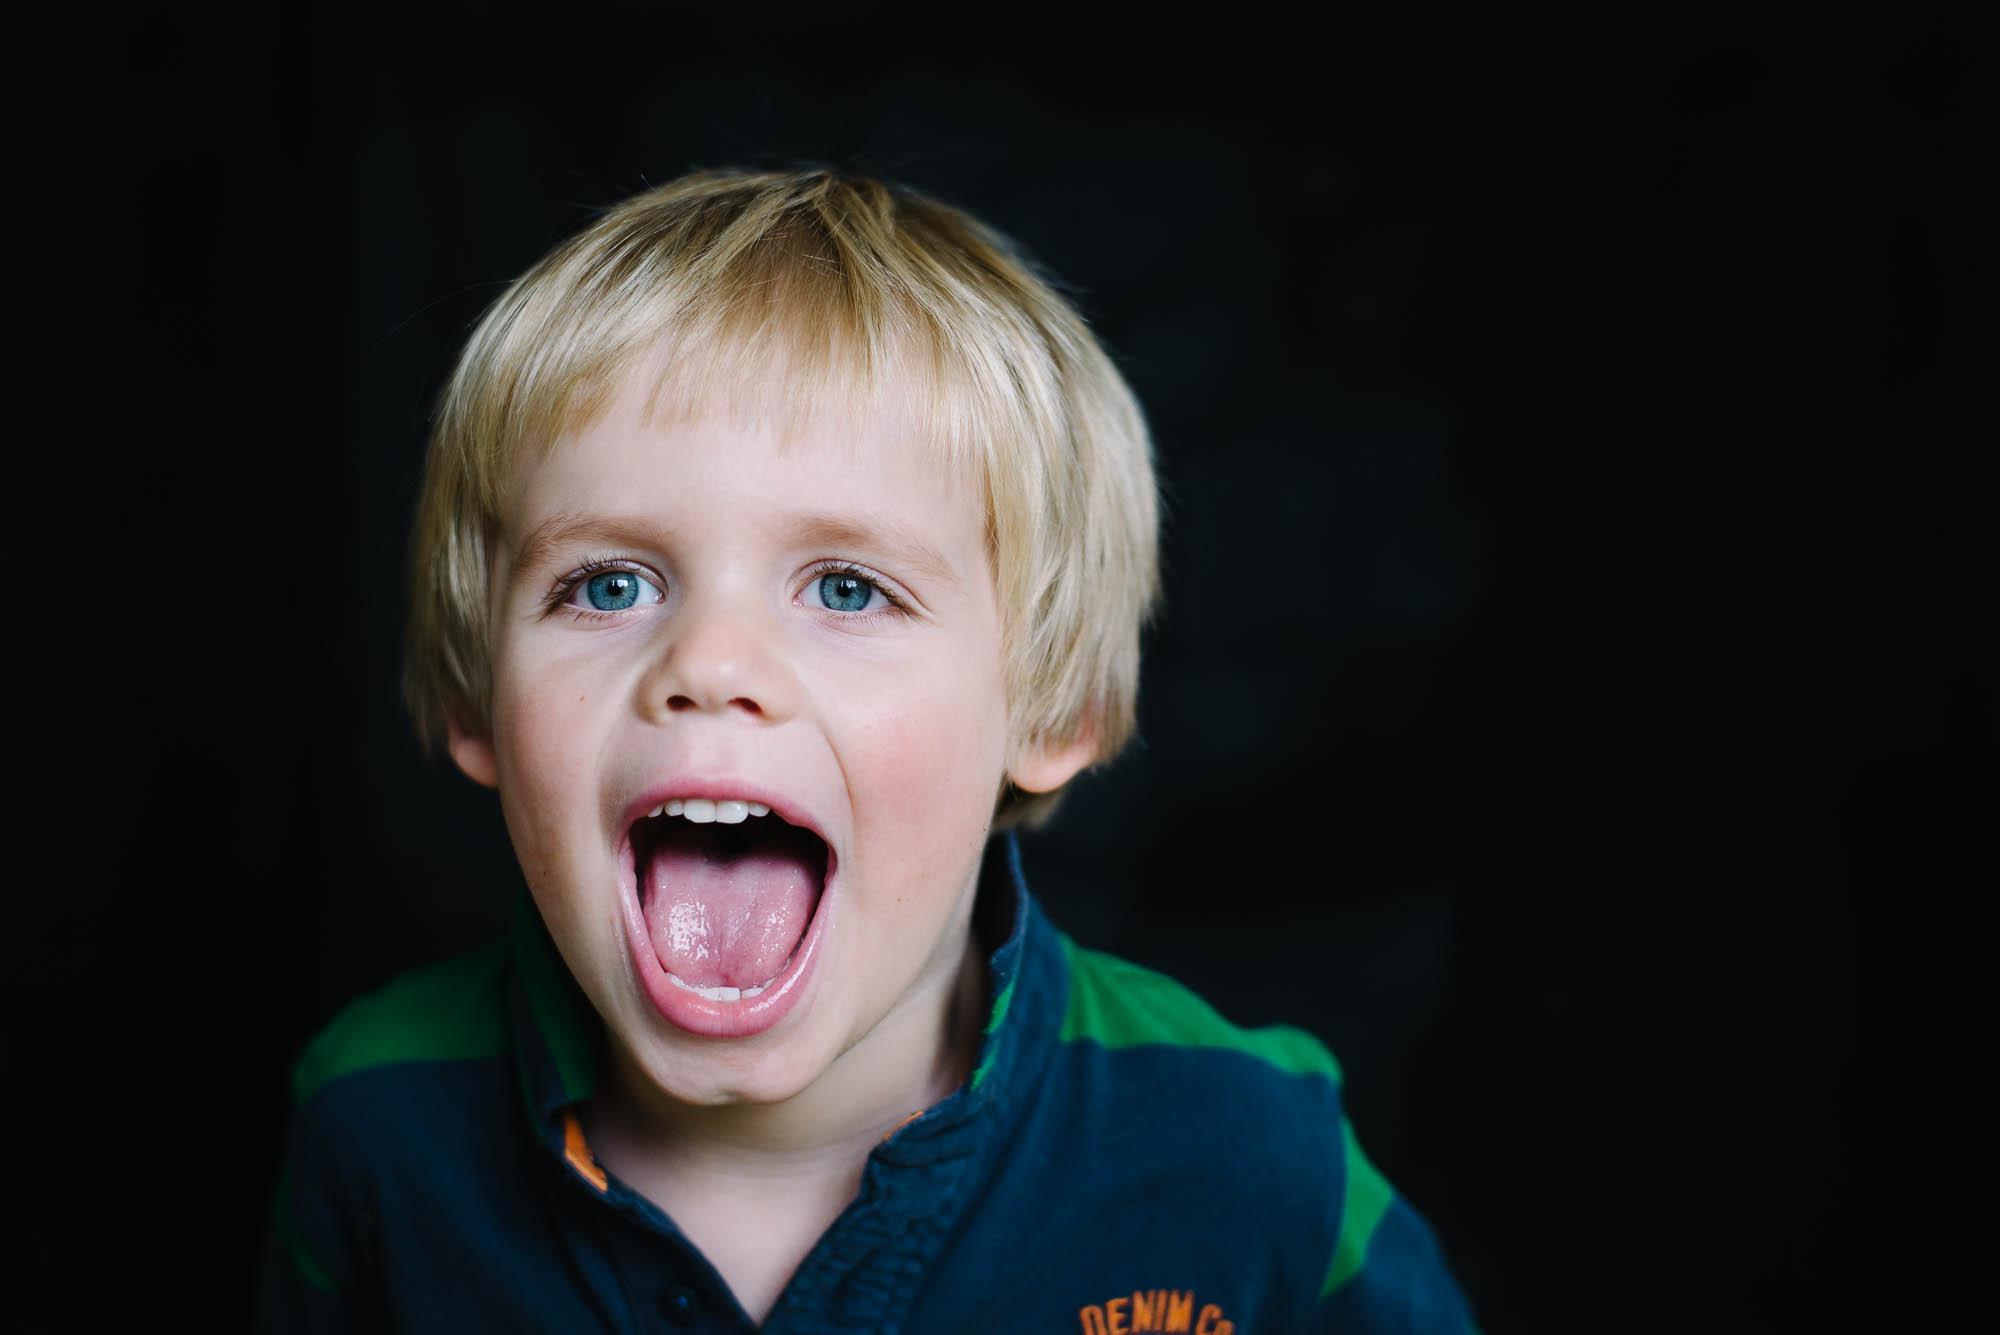 melbourne_family_photographer_childhood_portraits.jpg